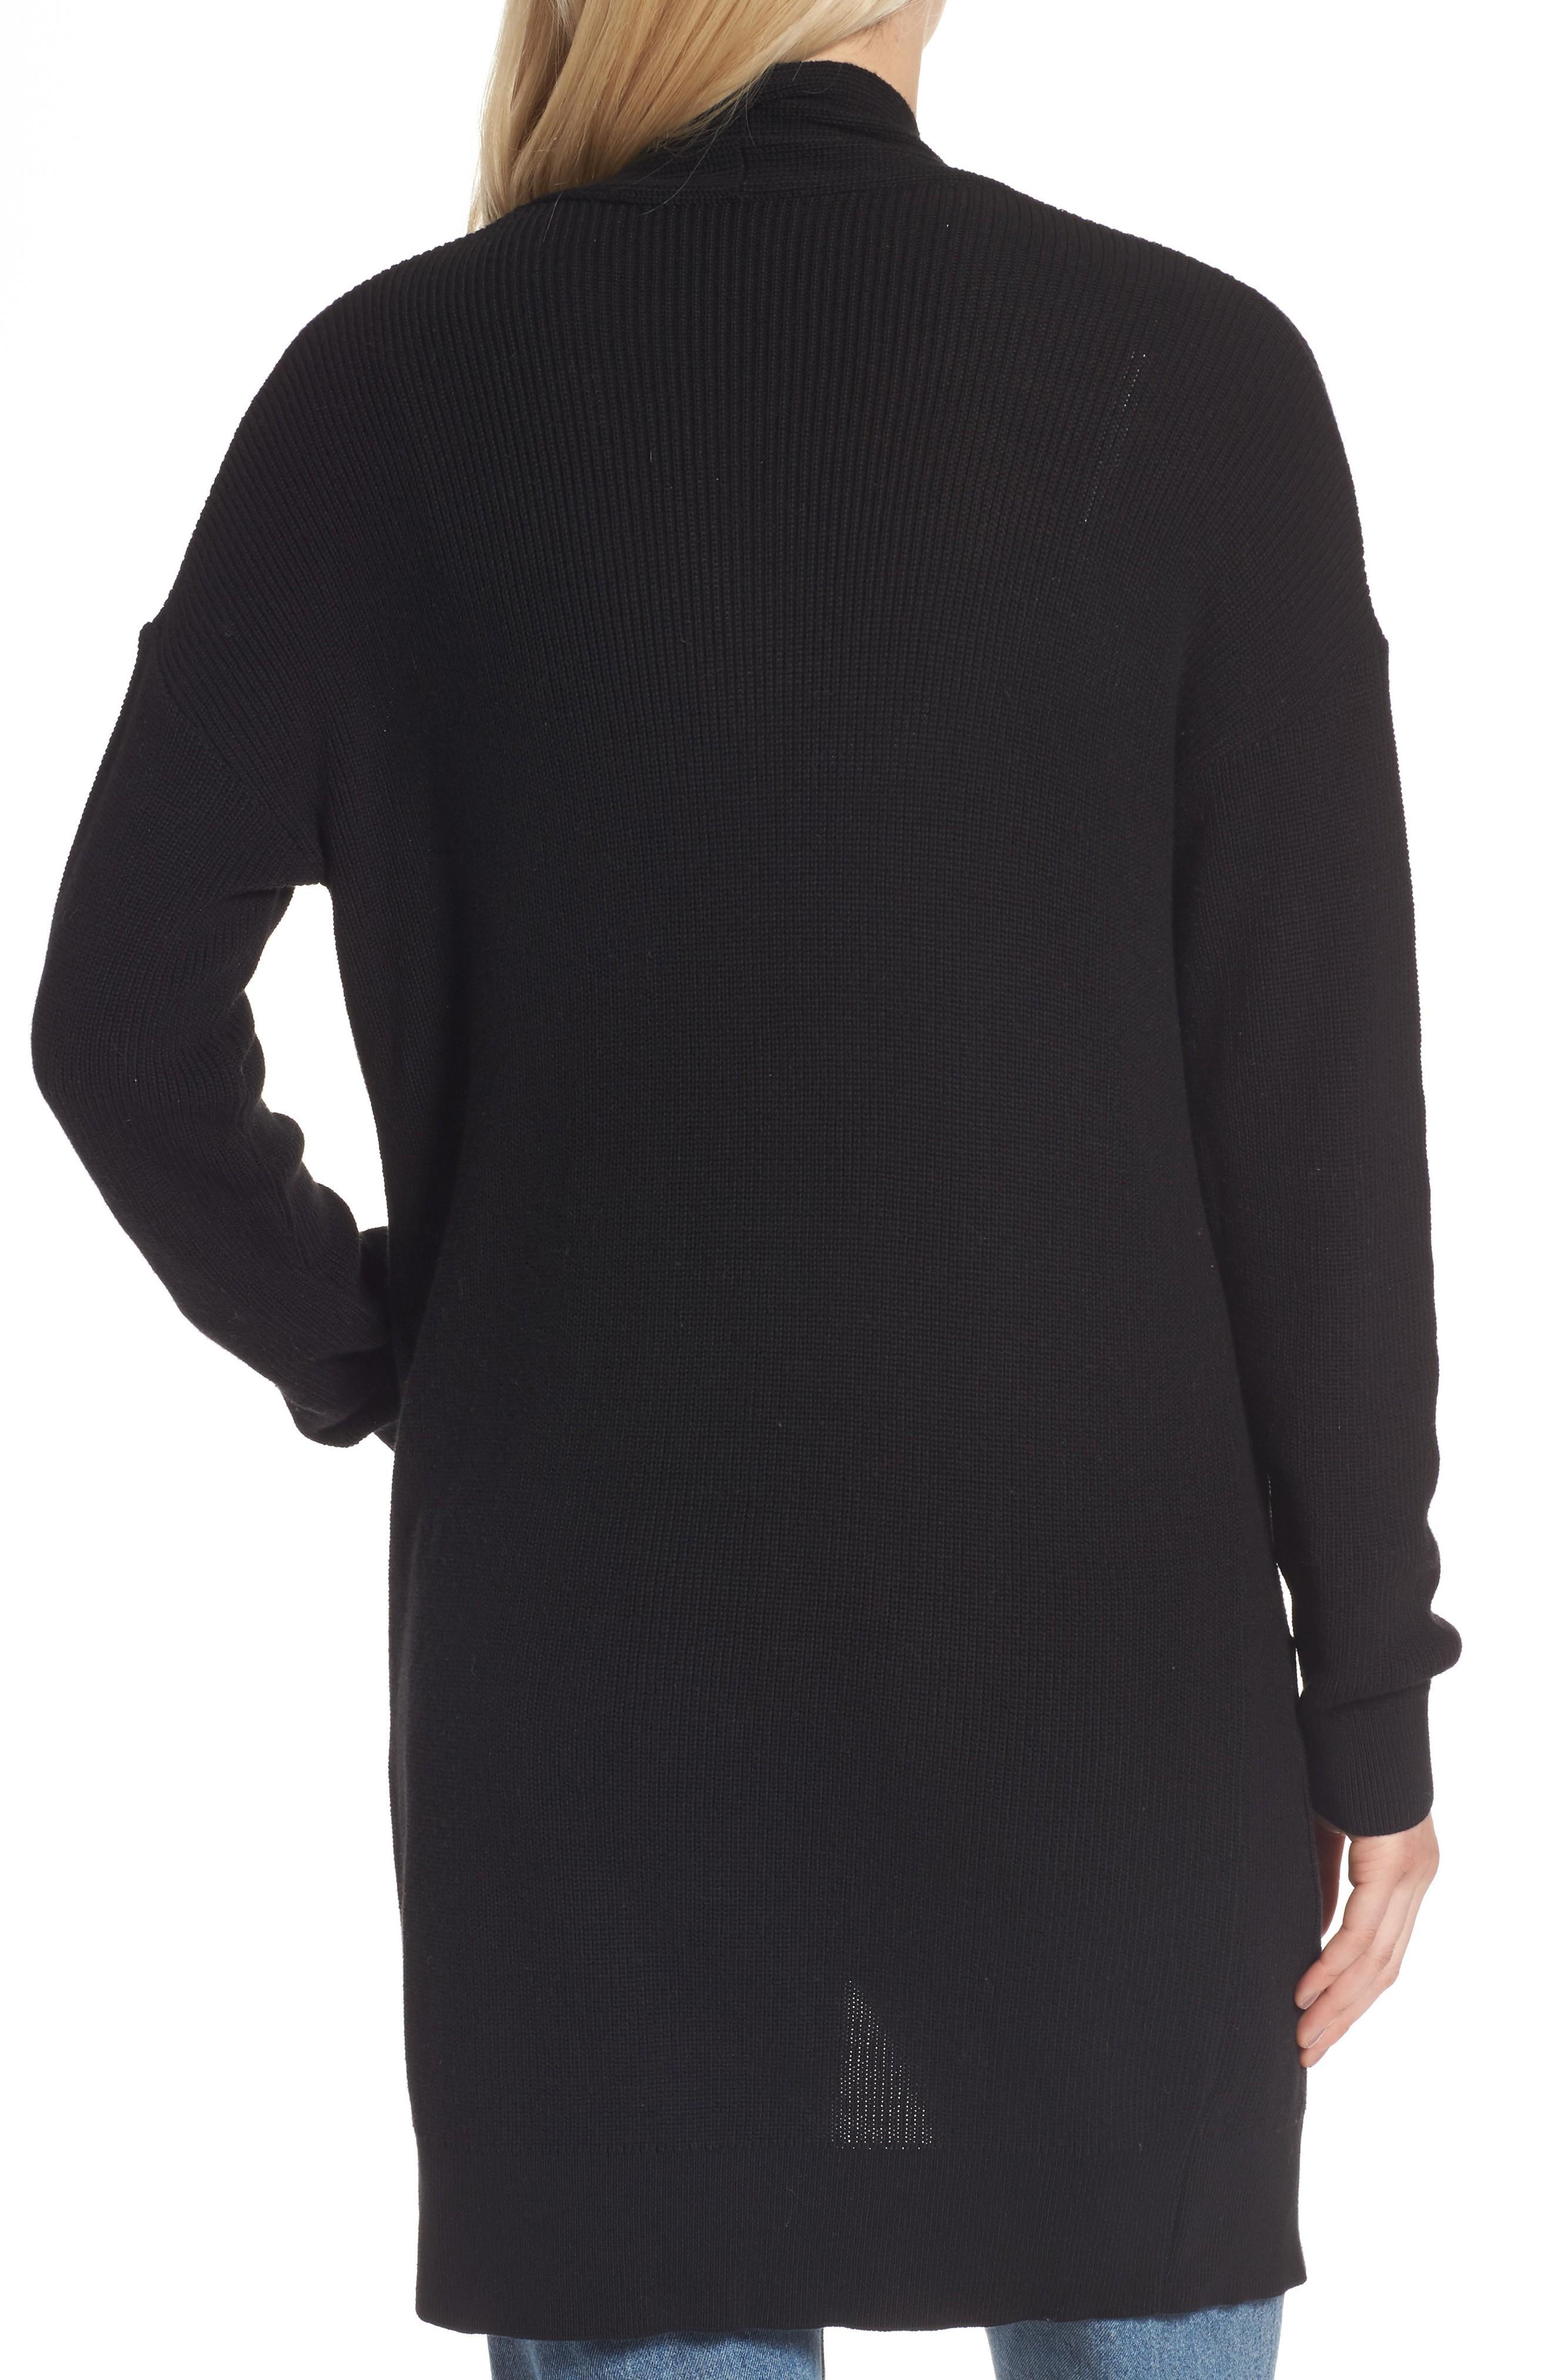 black cardigan womenu0027s cardigan sweaters: long, cropped u0026 more | nordstrom dpfwjwv